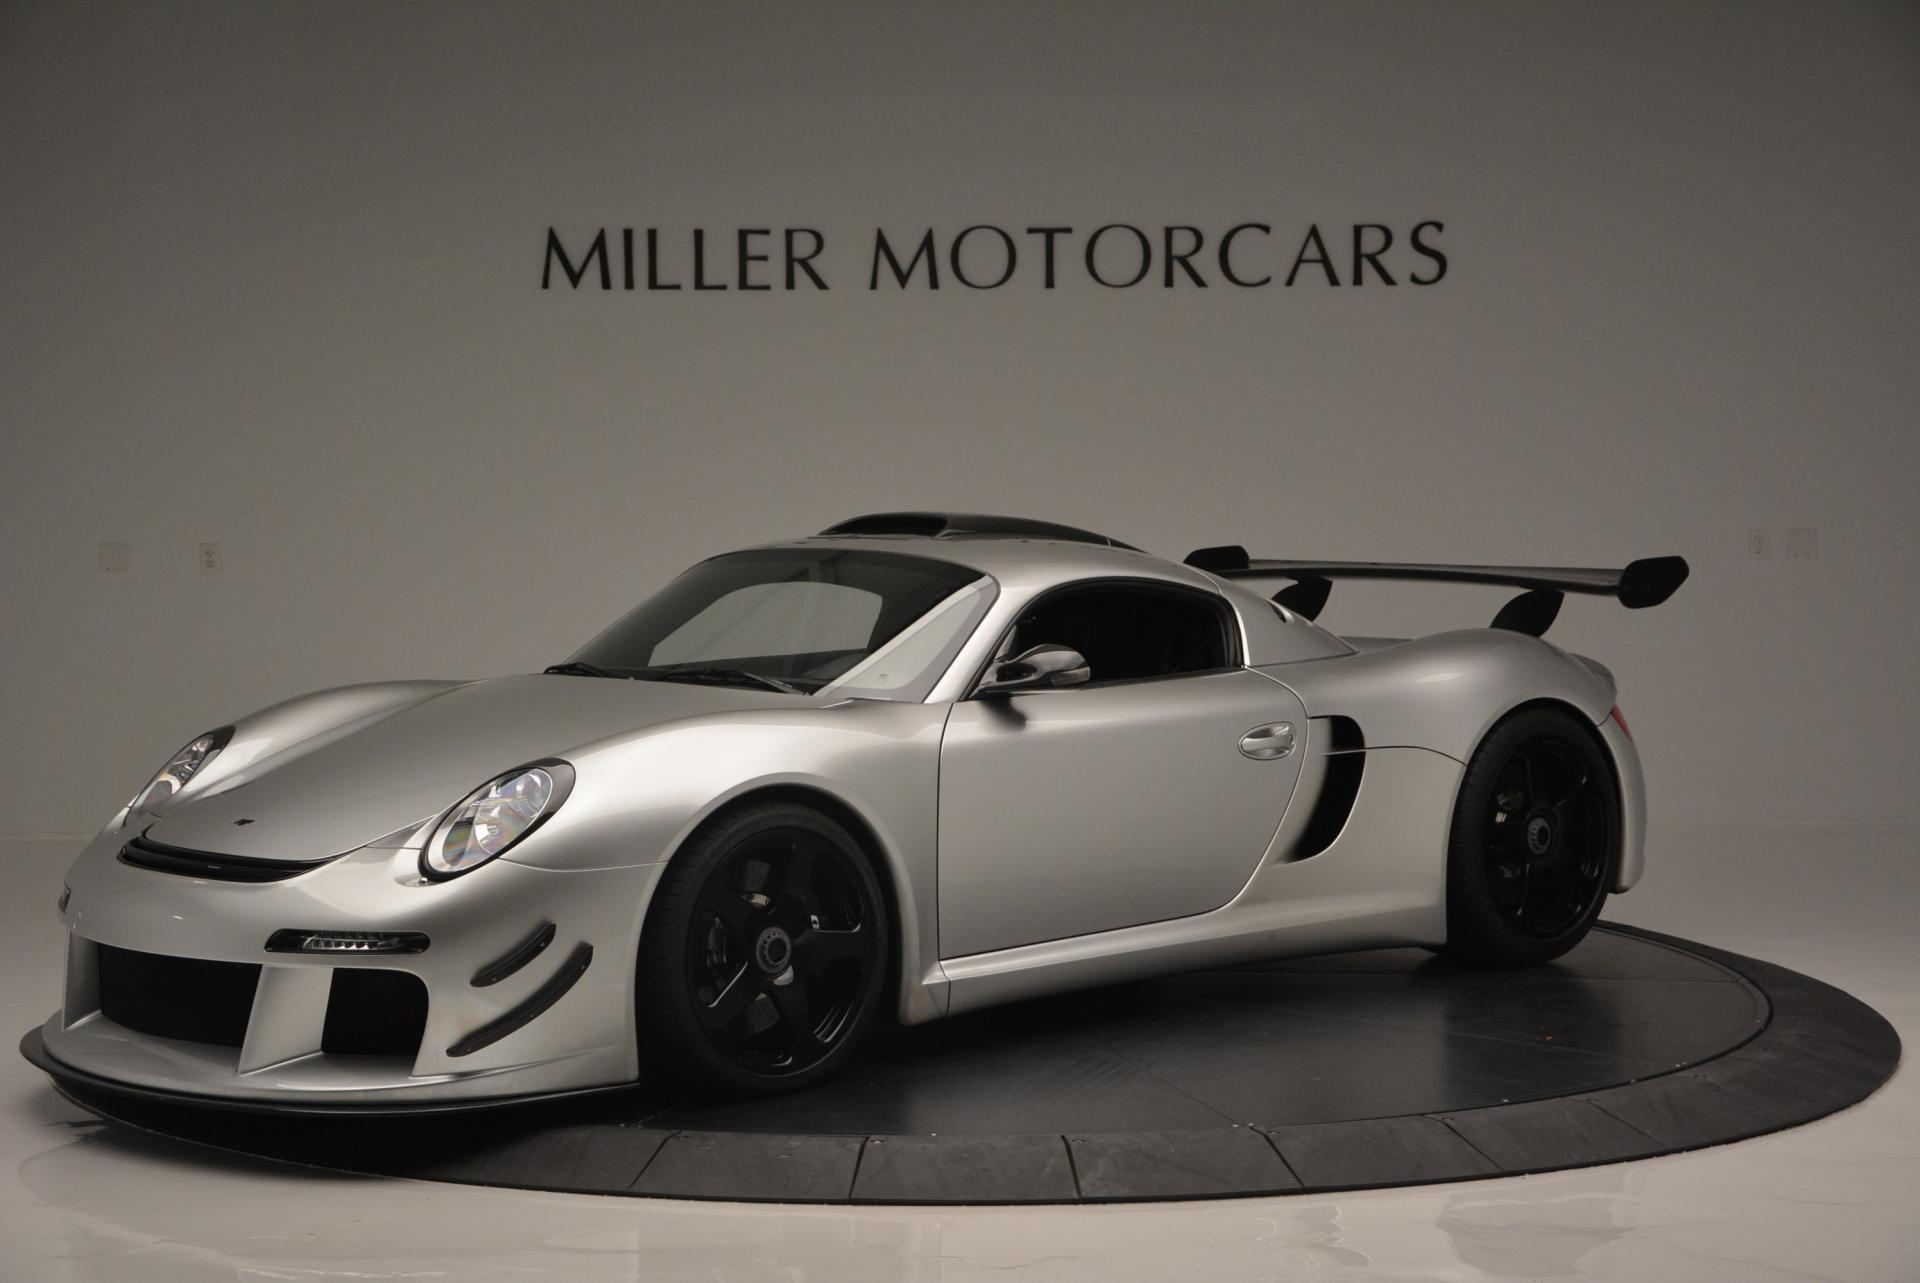 Used 2012 Porsche RUF CTR-3 Clubsport For Sale In Westport, CT 110_p2